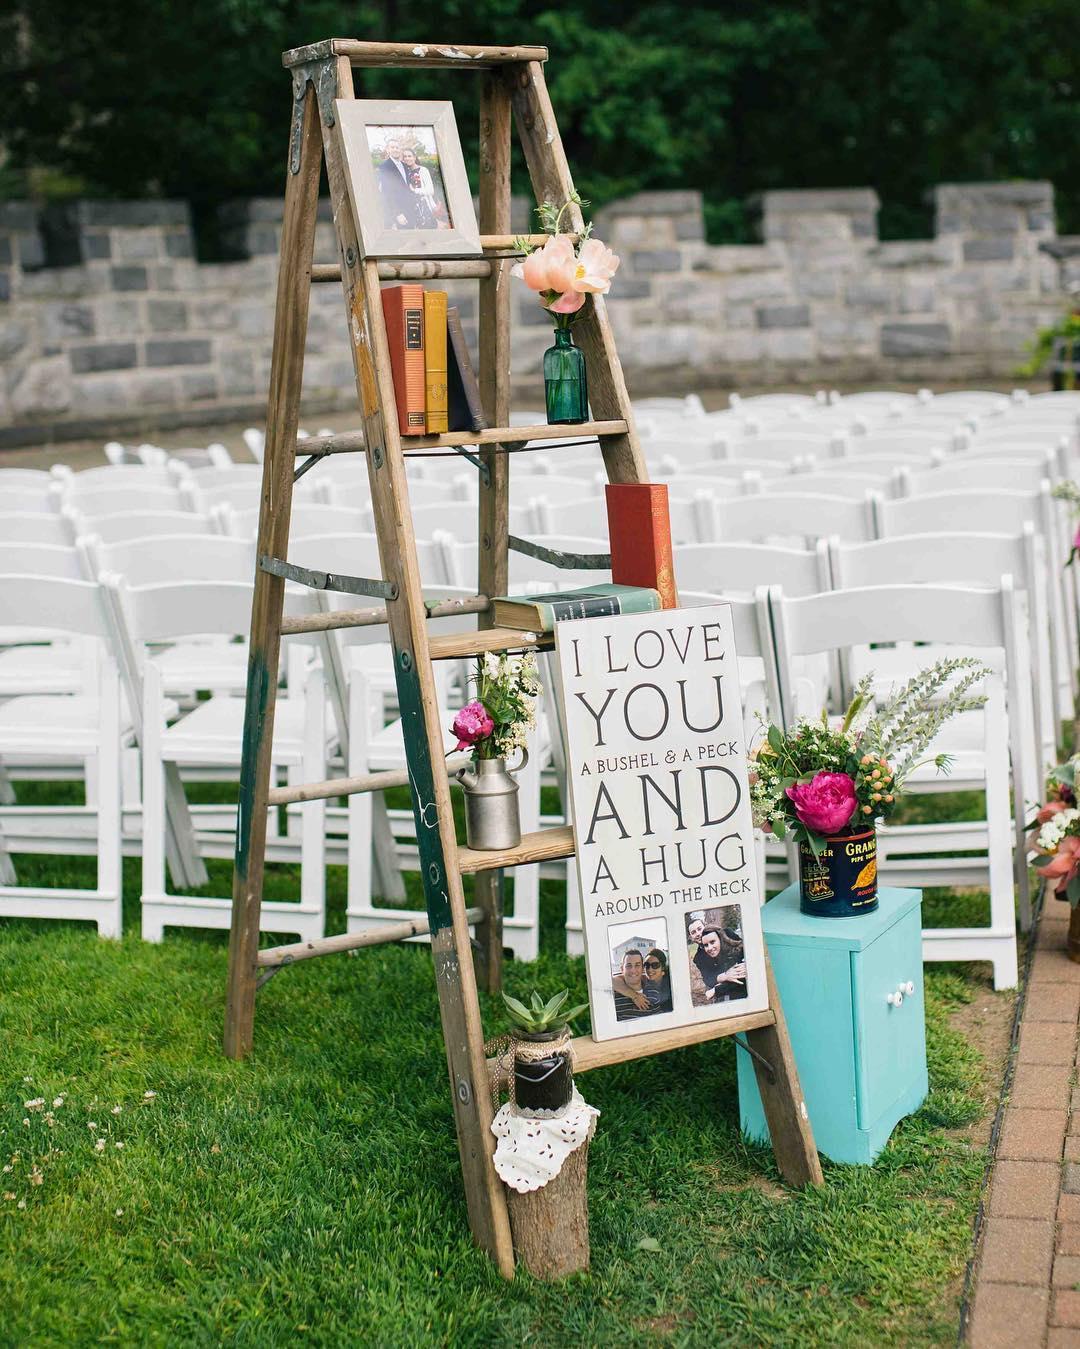 {shabby chic} photo | @callanphoto  #vintage #shabbychic #aislestyle #aisledecor #ceremony #thelittlethings #lotusfloraldesigns #weddingflorist #searlescastle